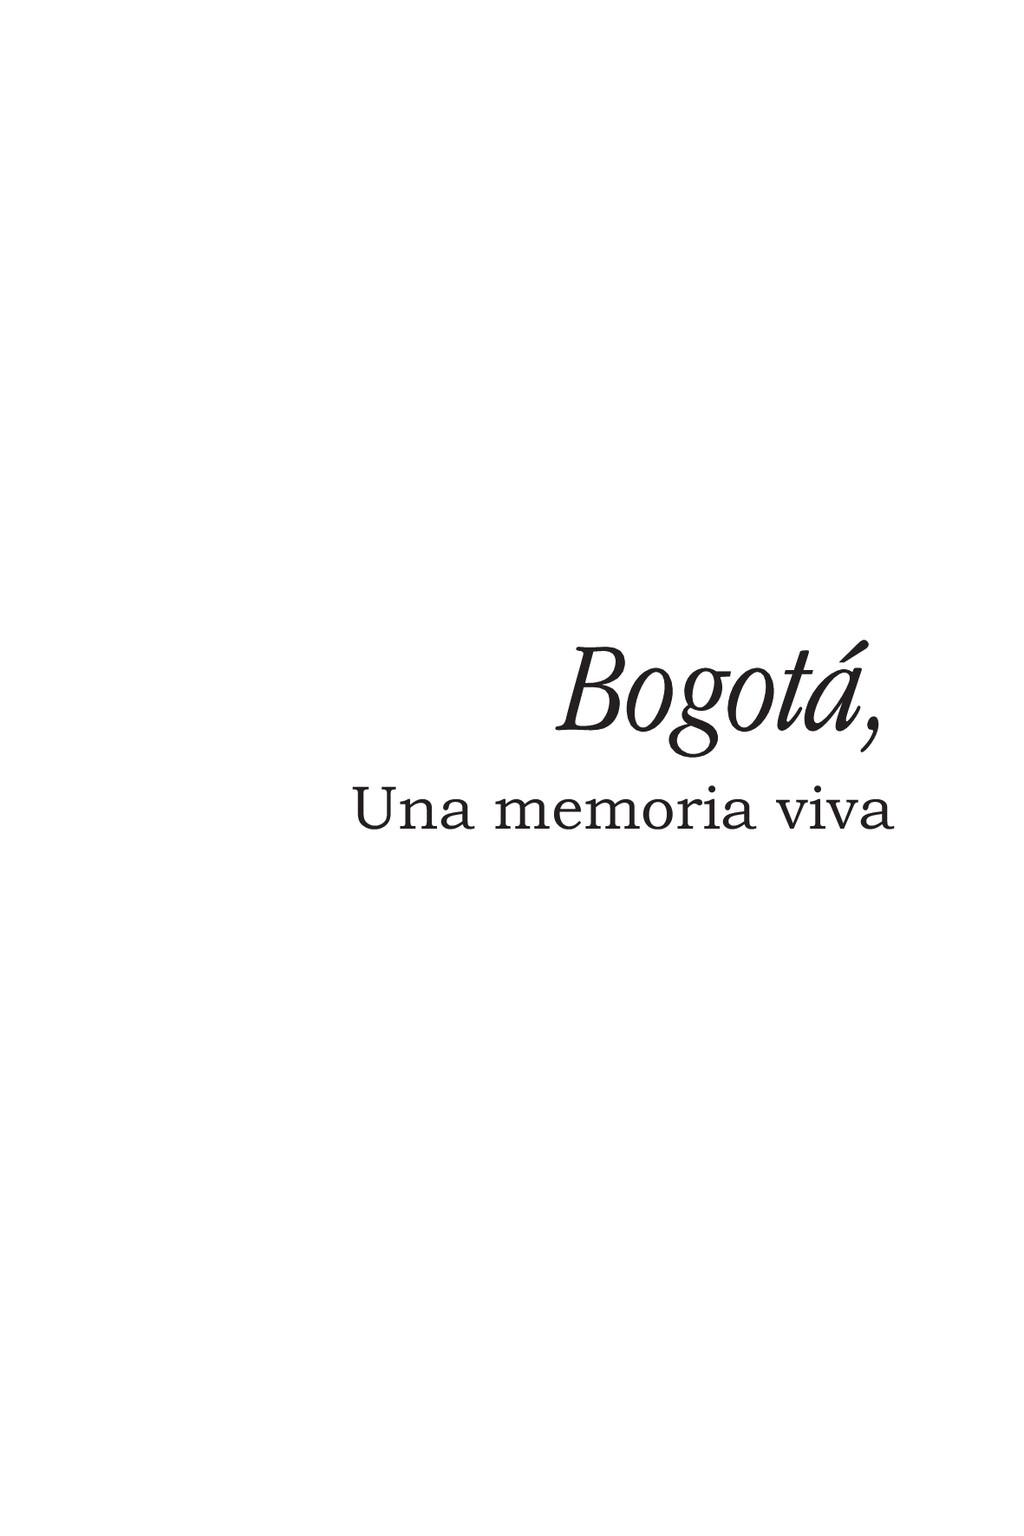 Bogotá, Una memoria viva